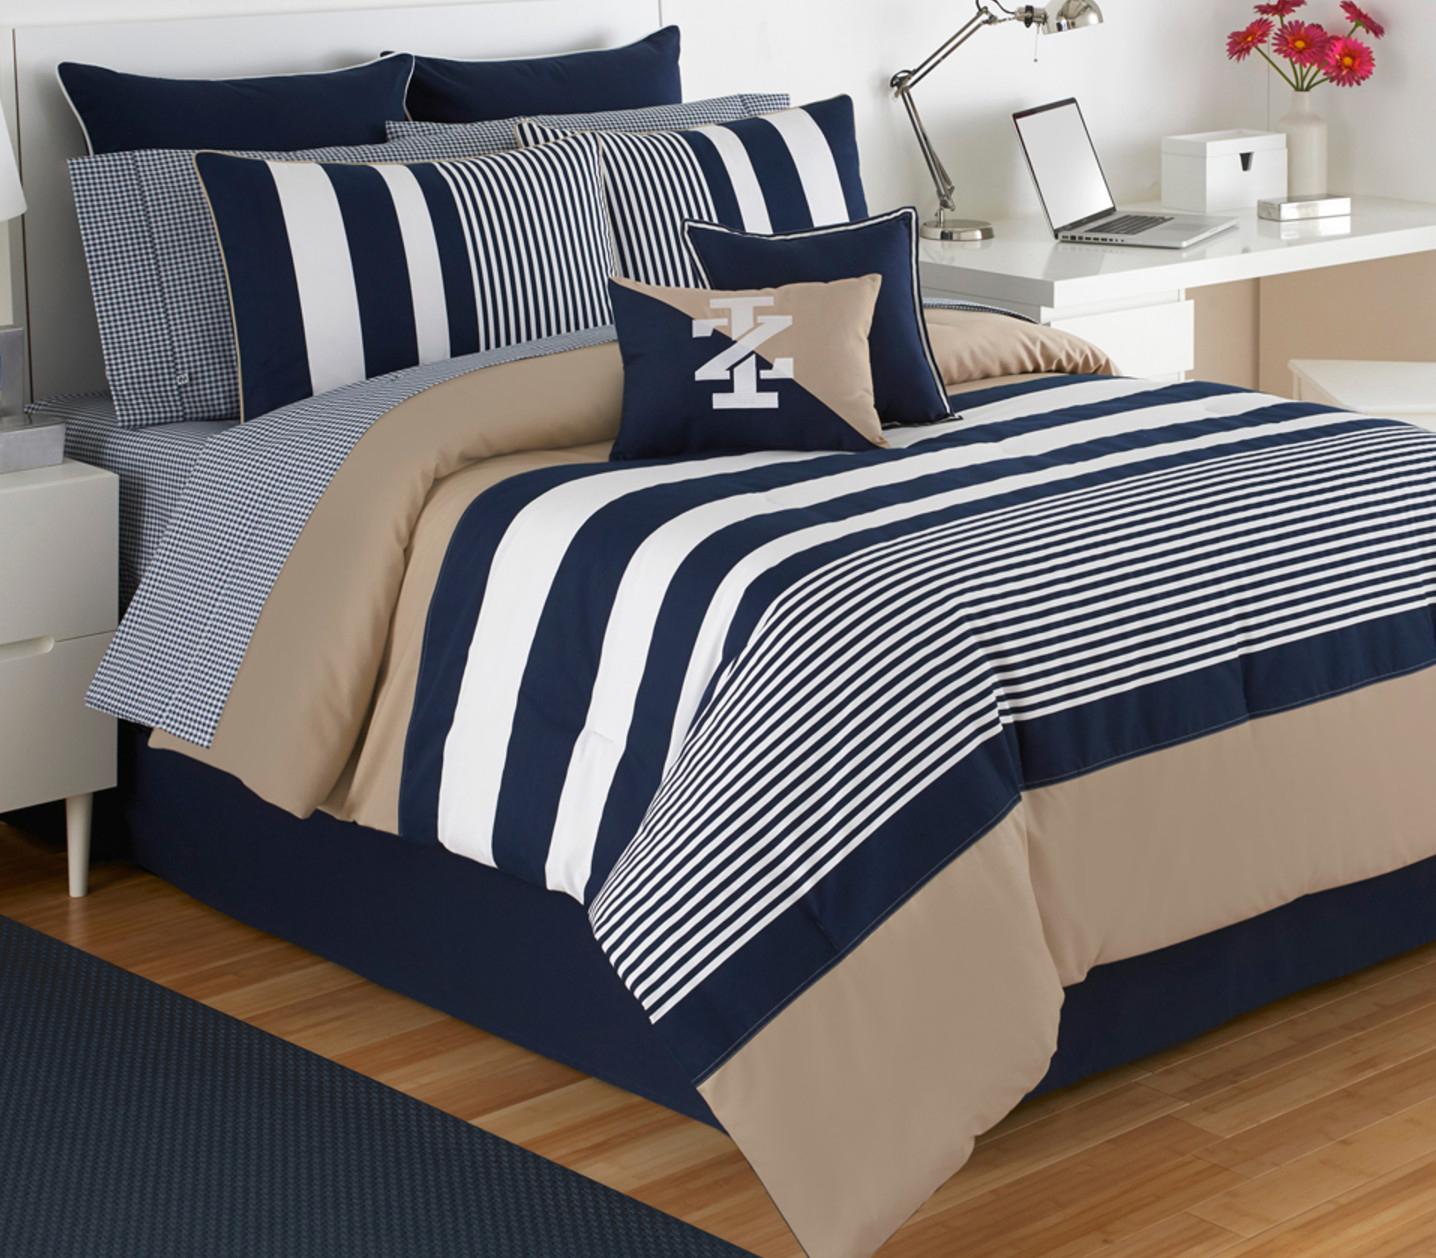 Classic Stripe By Izod Bedding Beddingsuperstore Com